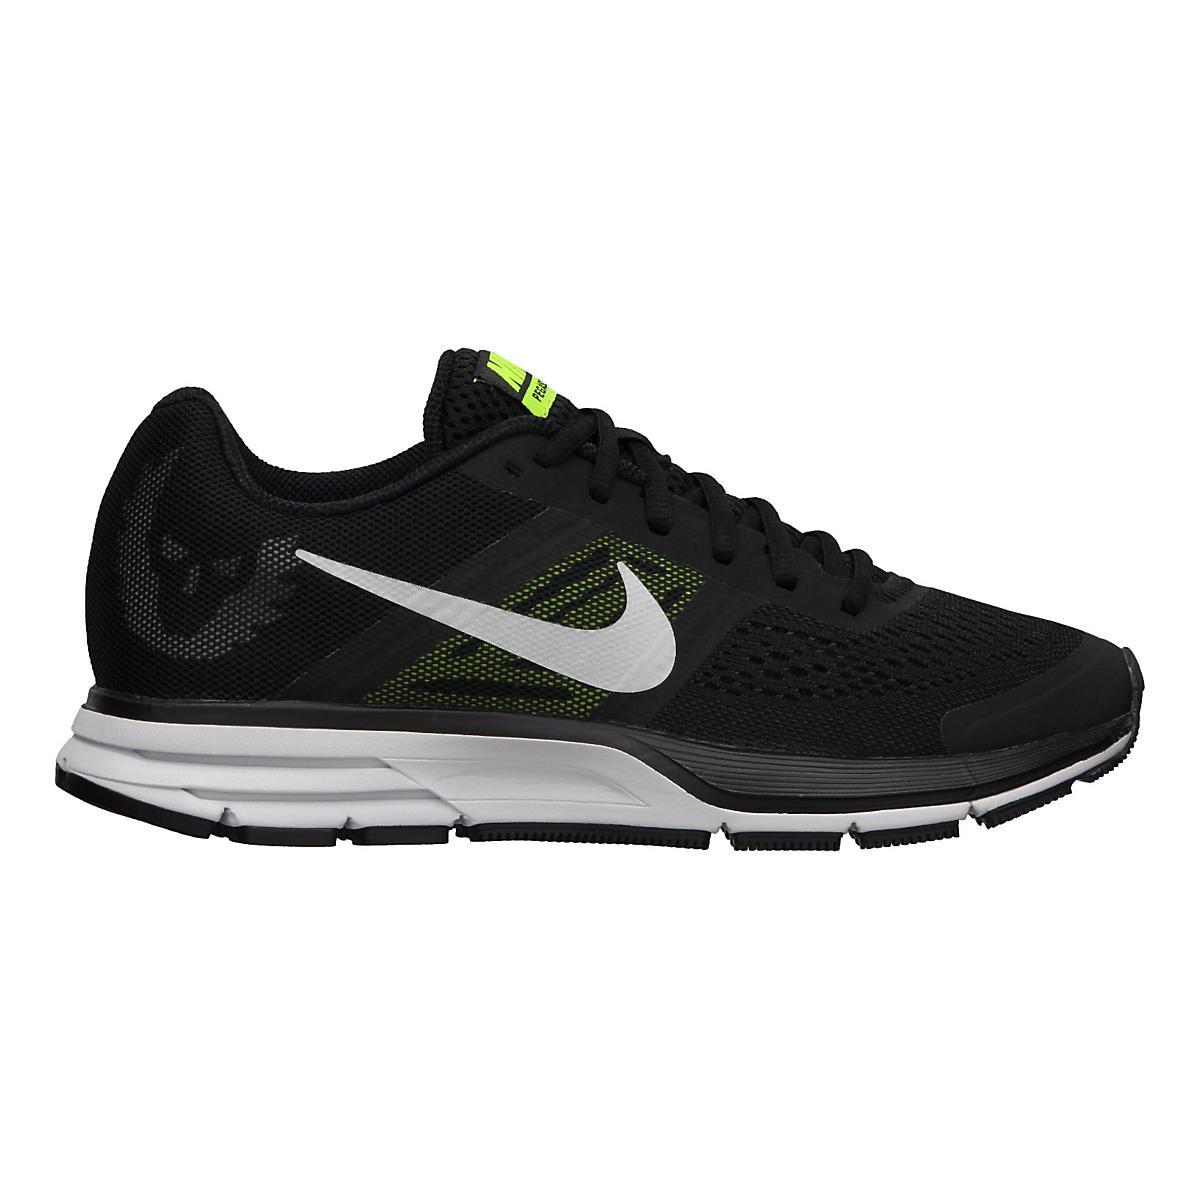 huge discount bbc05 1a805 Mens Nike Air Pegasus+ 30 Oregon Project Running Shoe at Road Runner Sports